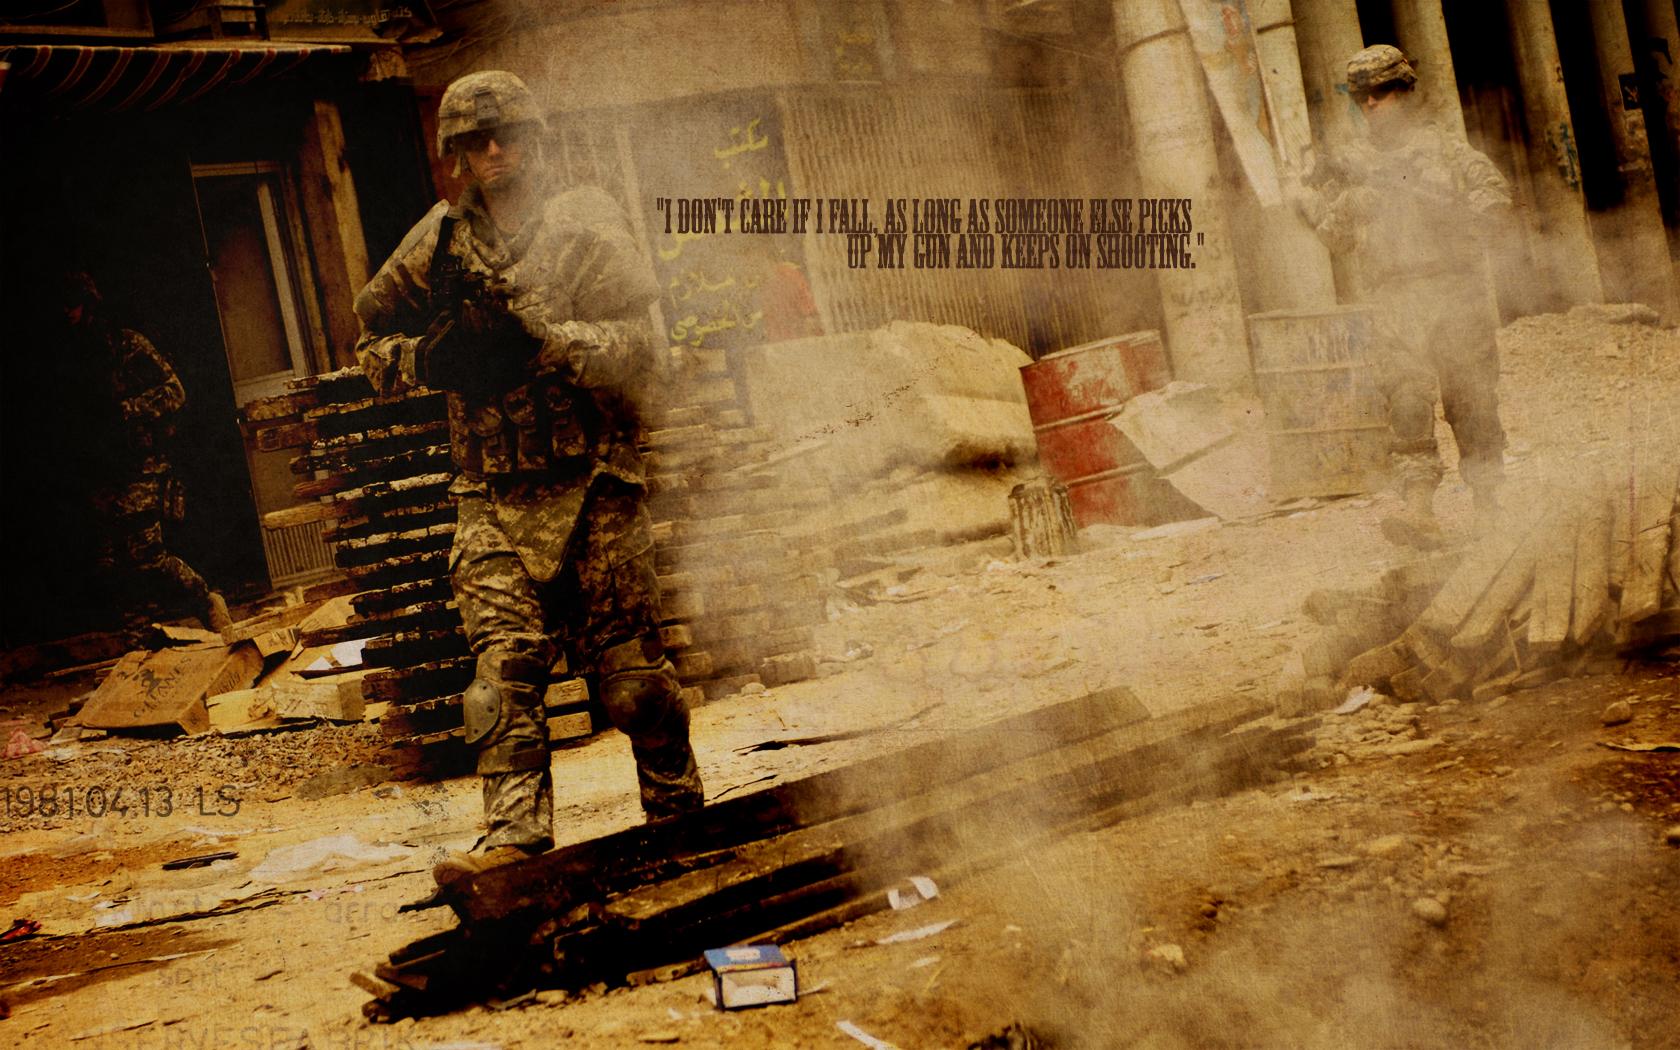 Badass Army Wallpapers Desktop Image 1680x1050